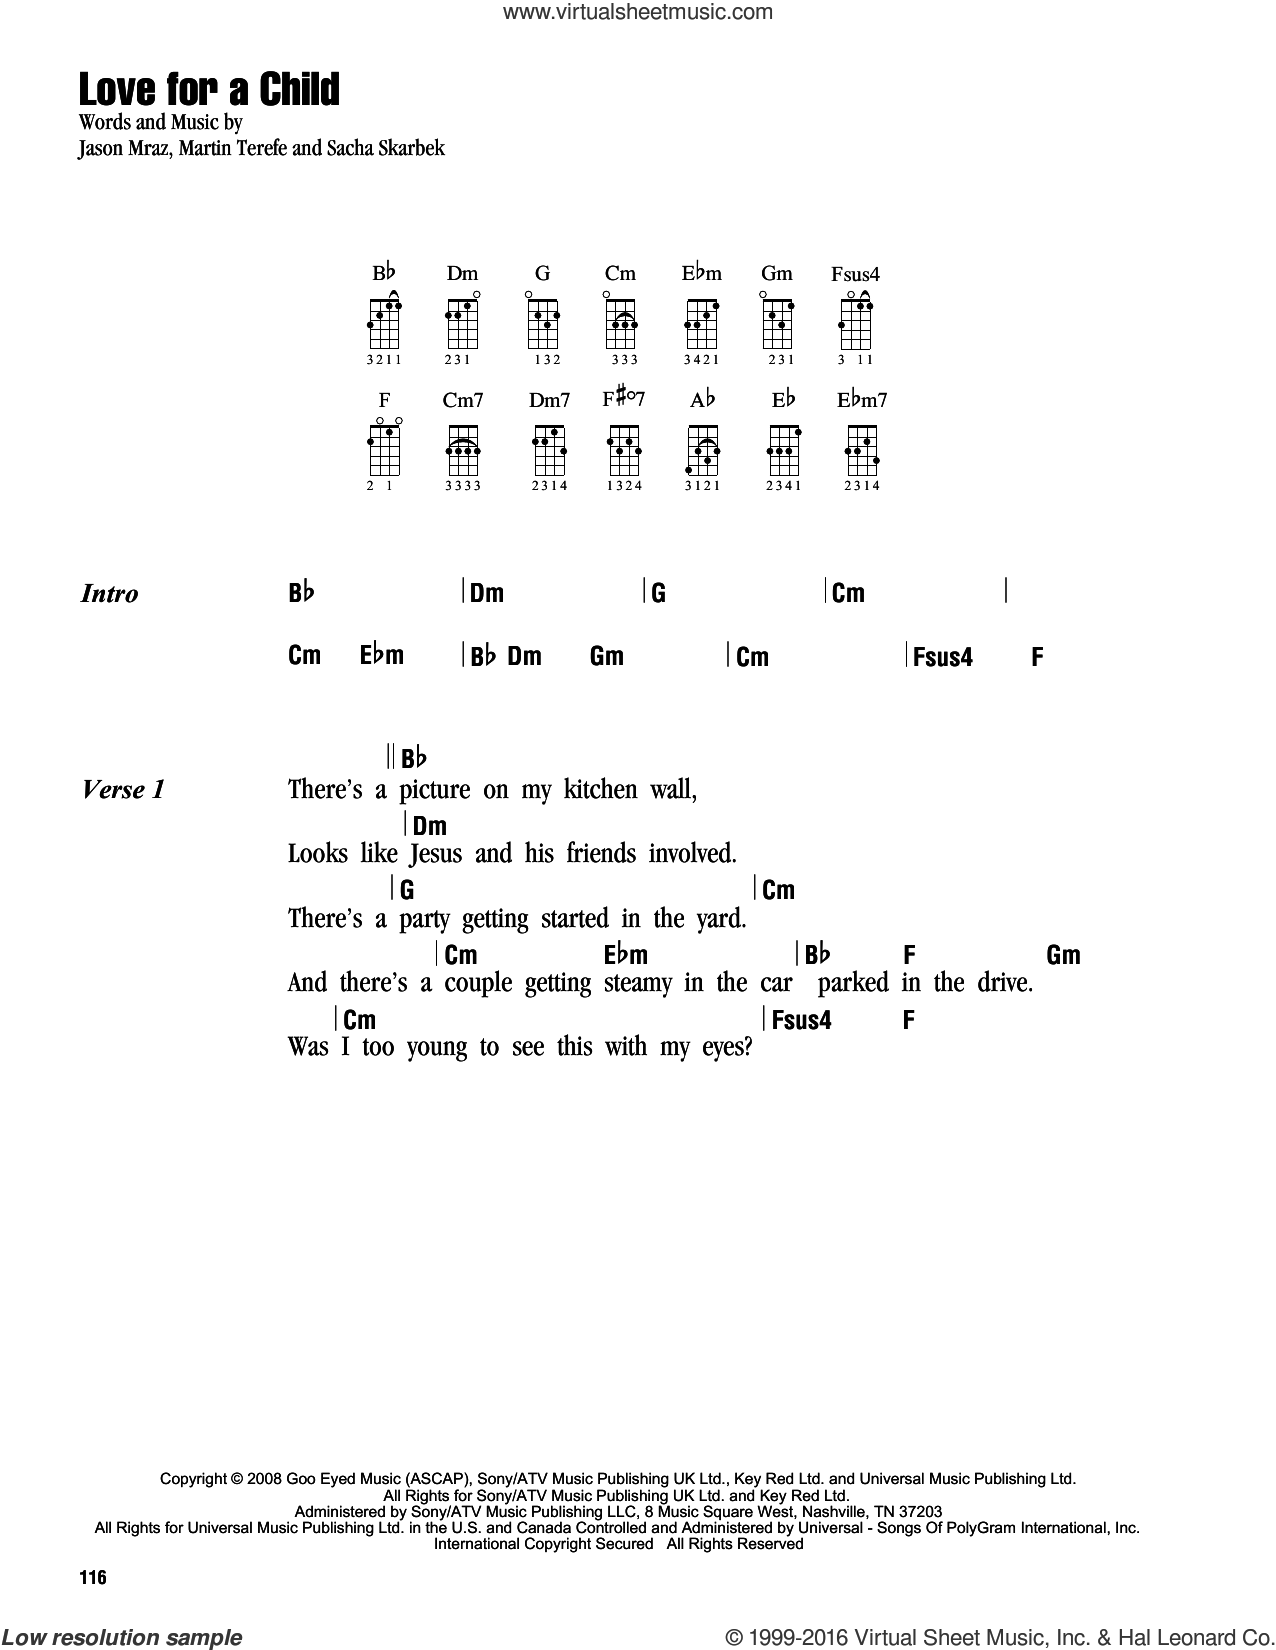 Love For A Child sheet music for ukulele (chords) by Jason Mraz, Martin Terefe and Sacha Skarbek, intermediate skill level